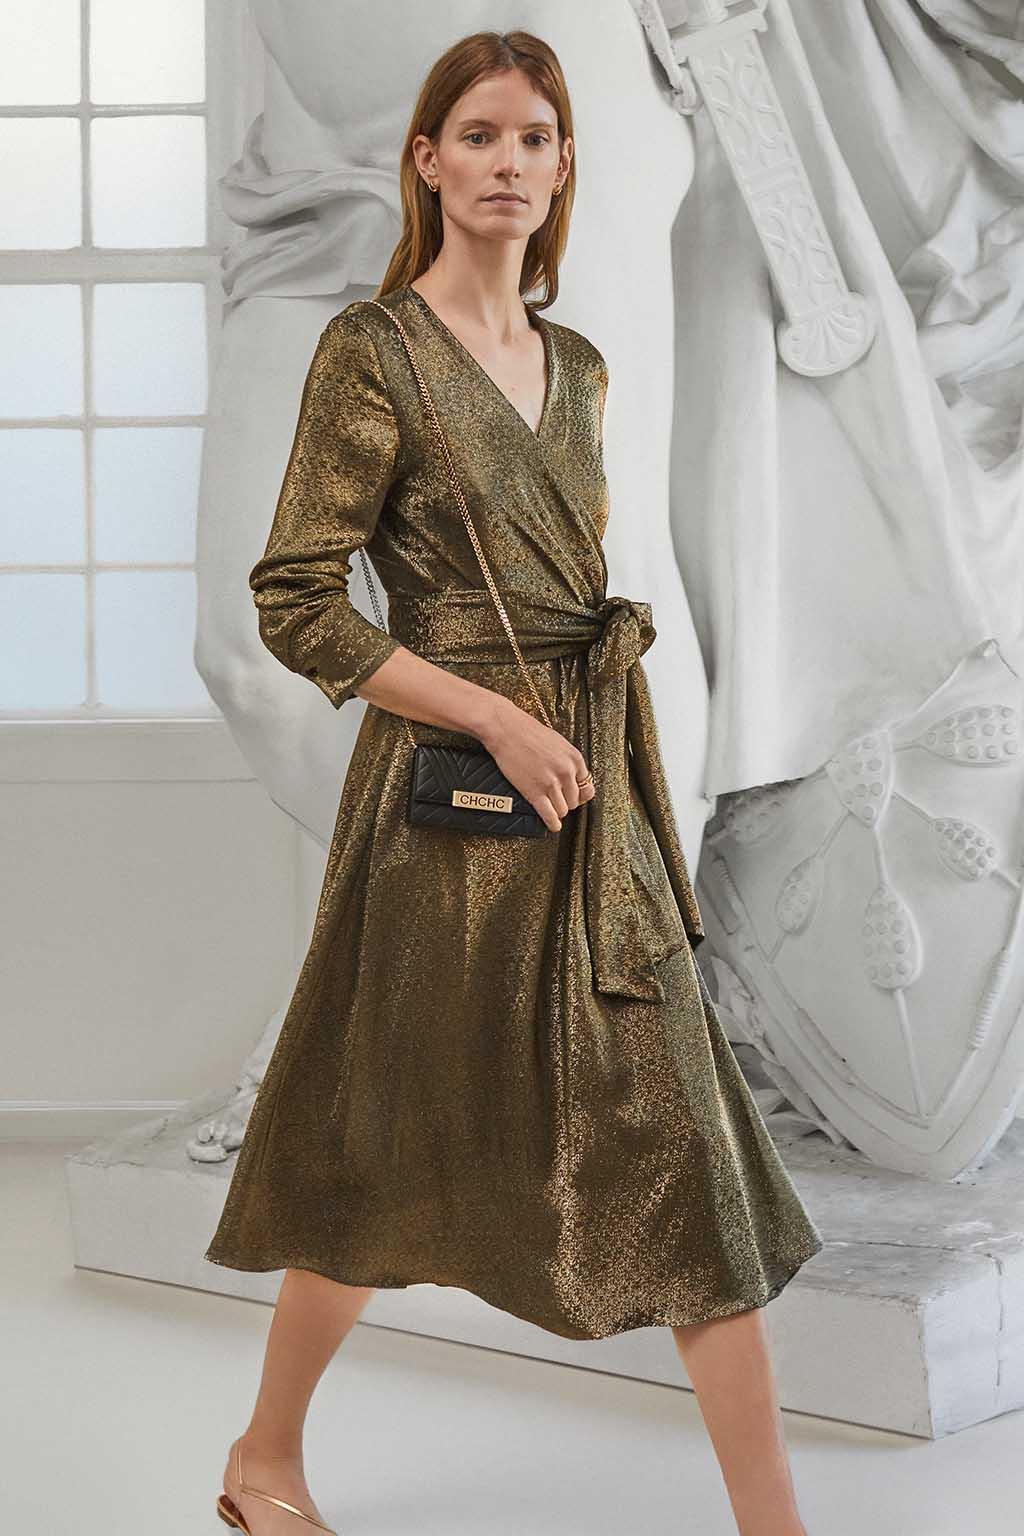 CH Carolina Herrera. New Womenswear Collection Evening. Look 17